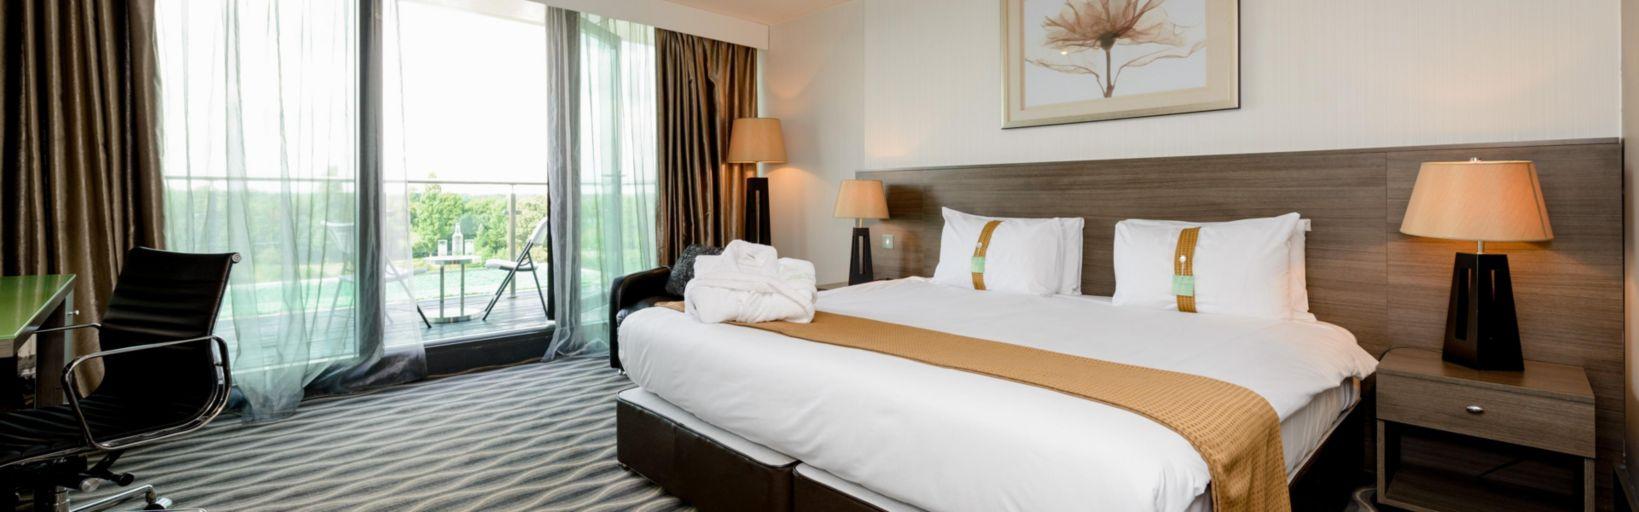 Holiday Inn Surbiton Hotels London Kingston South Hotel Room Rates